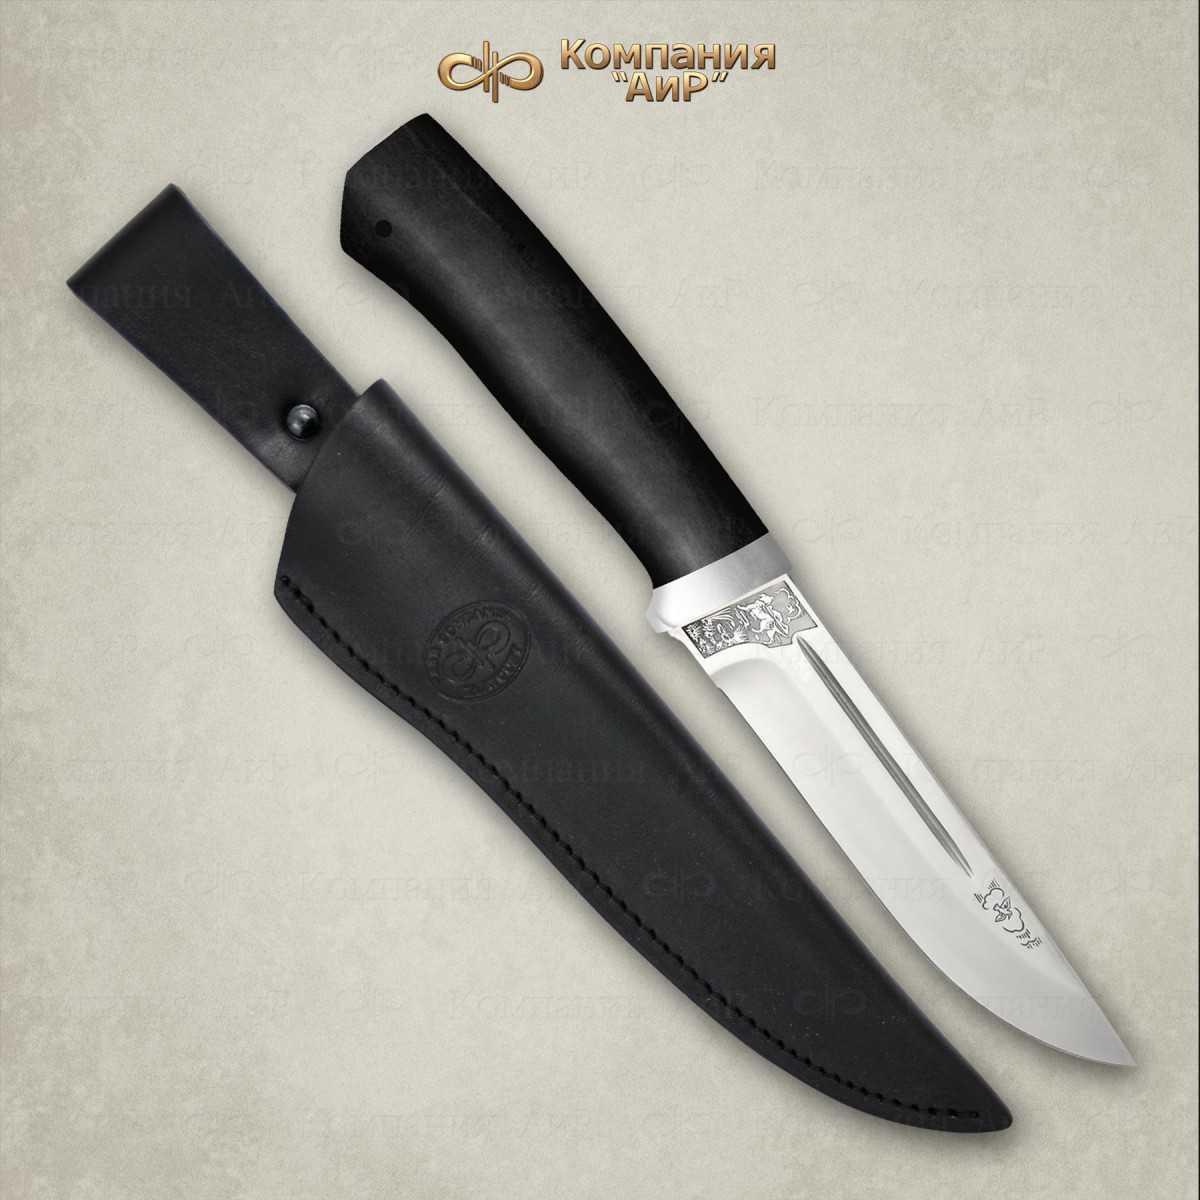 Нож Бекас, сталь Elmax, граб, АиР фото